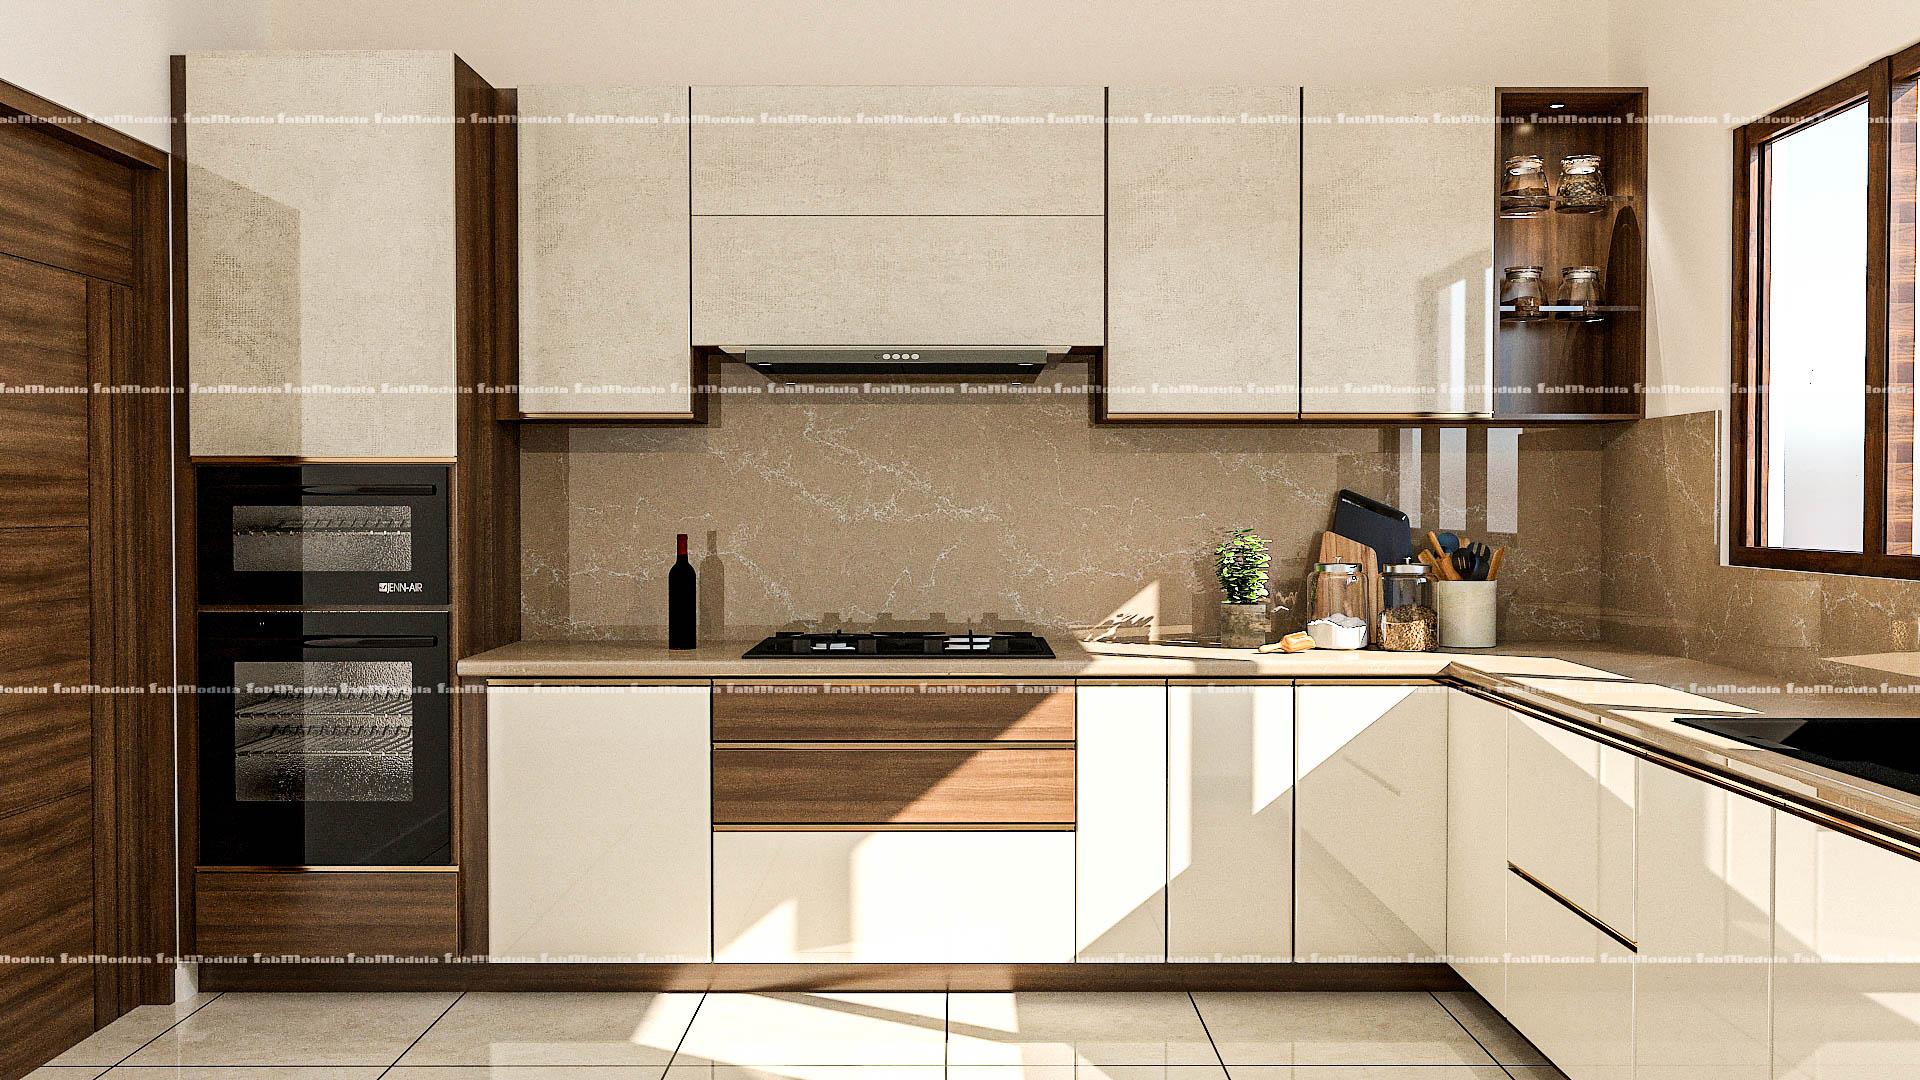 Best Modular Kitchen Interior Designers in Bangalore   FabModula